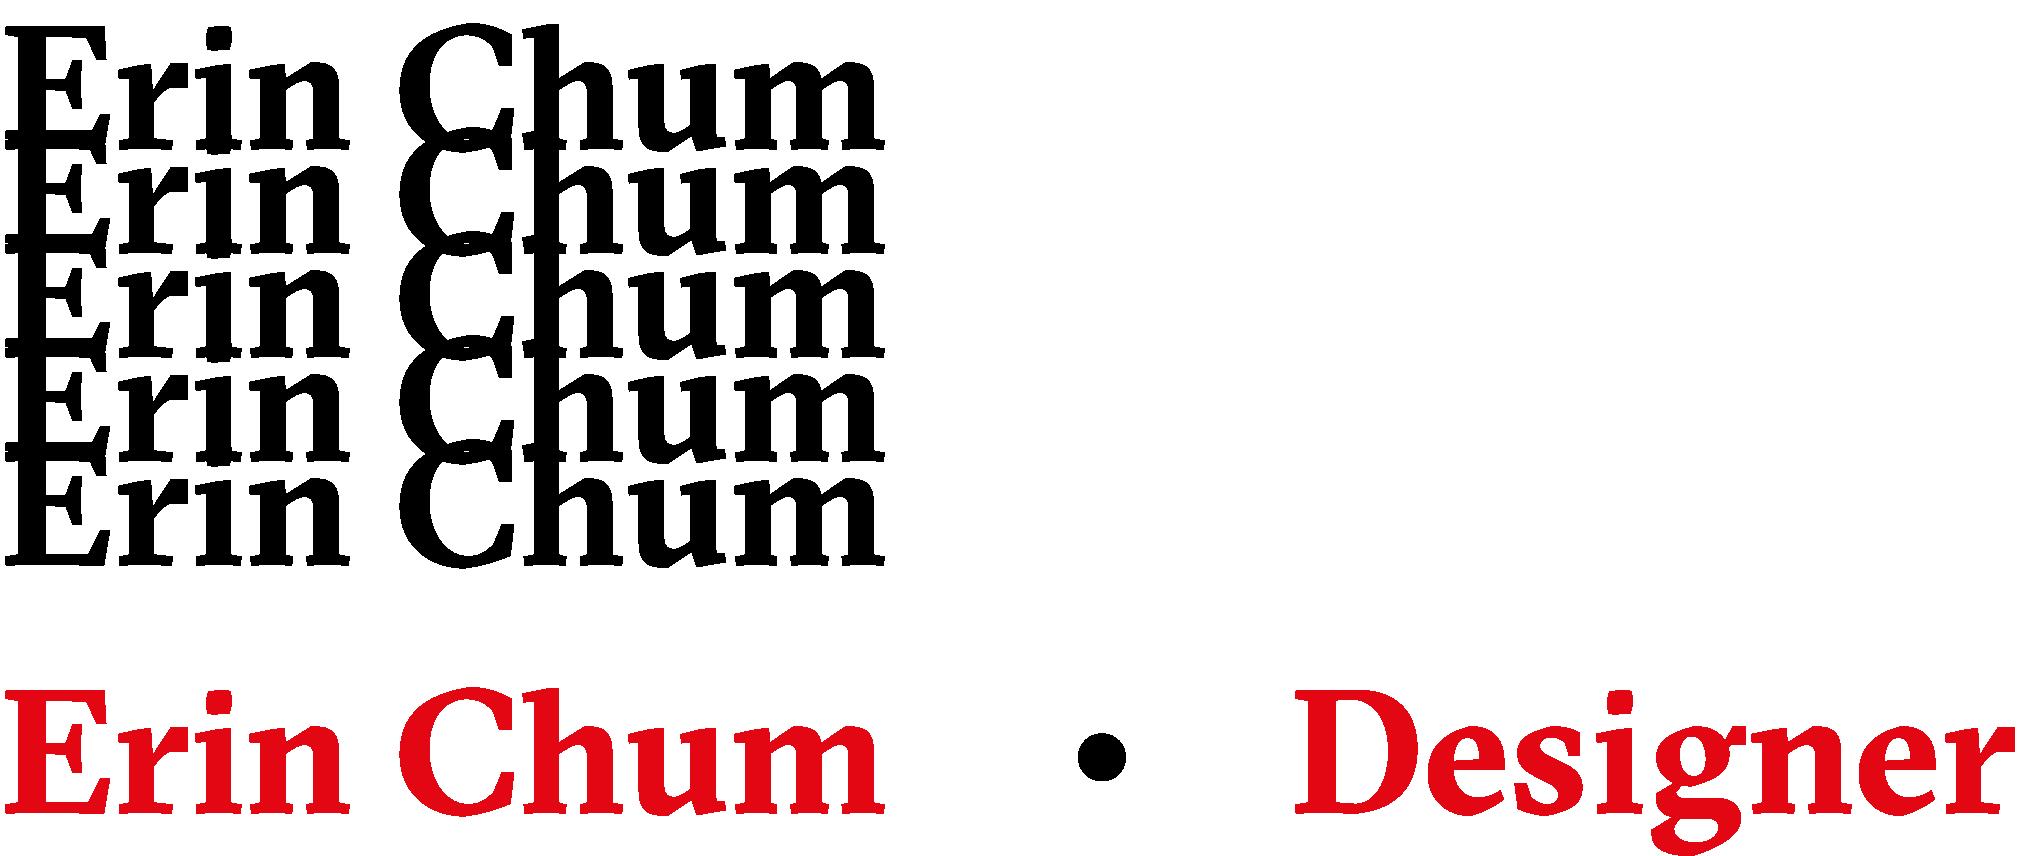 eRin Chum